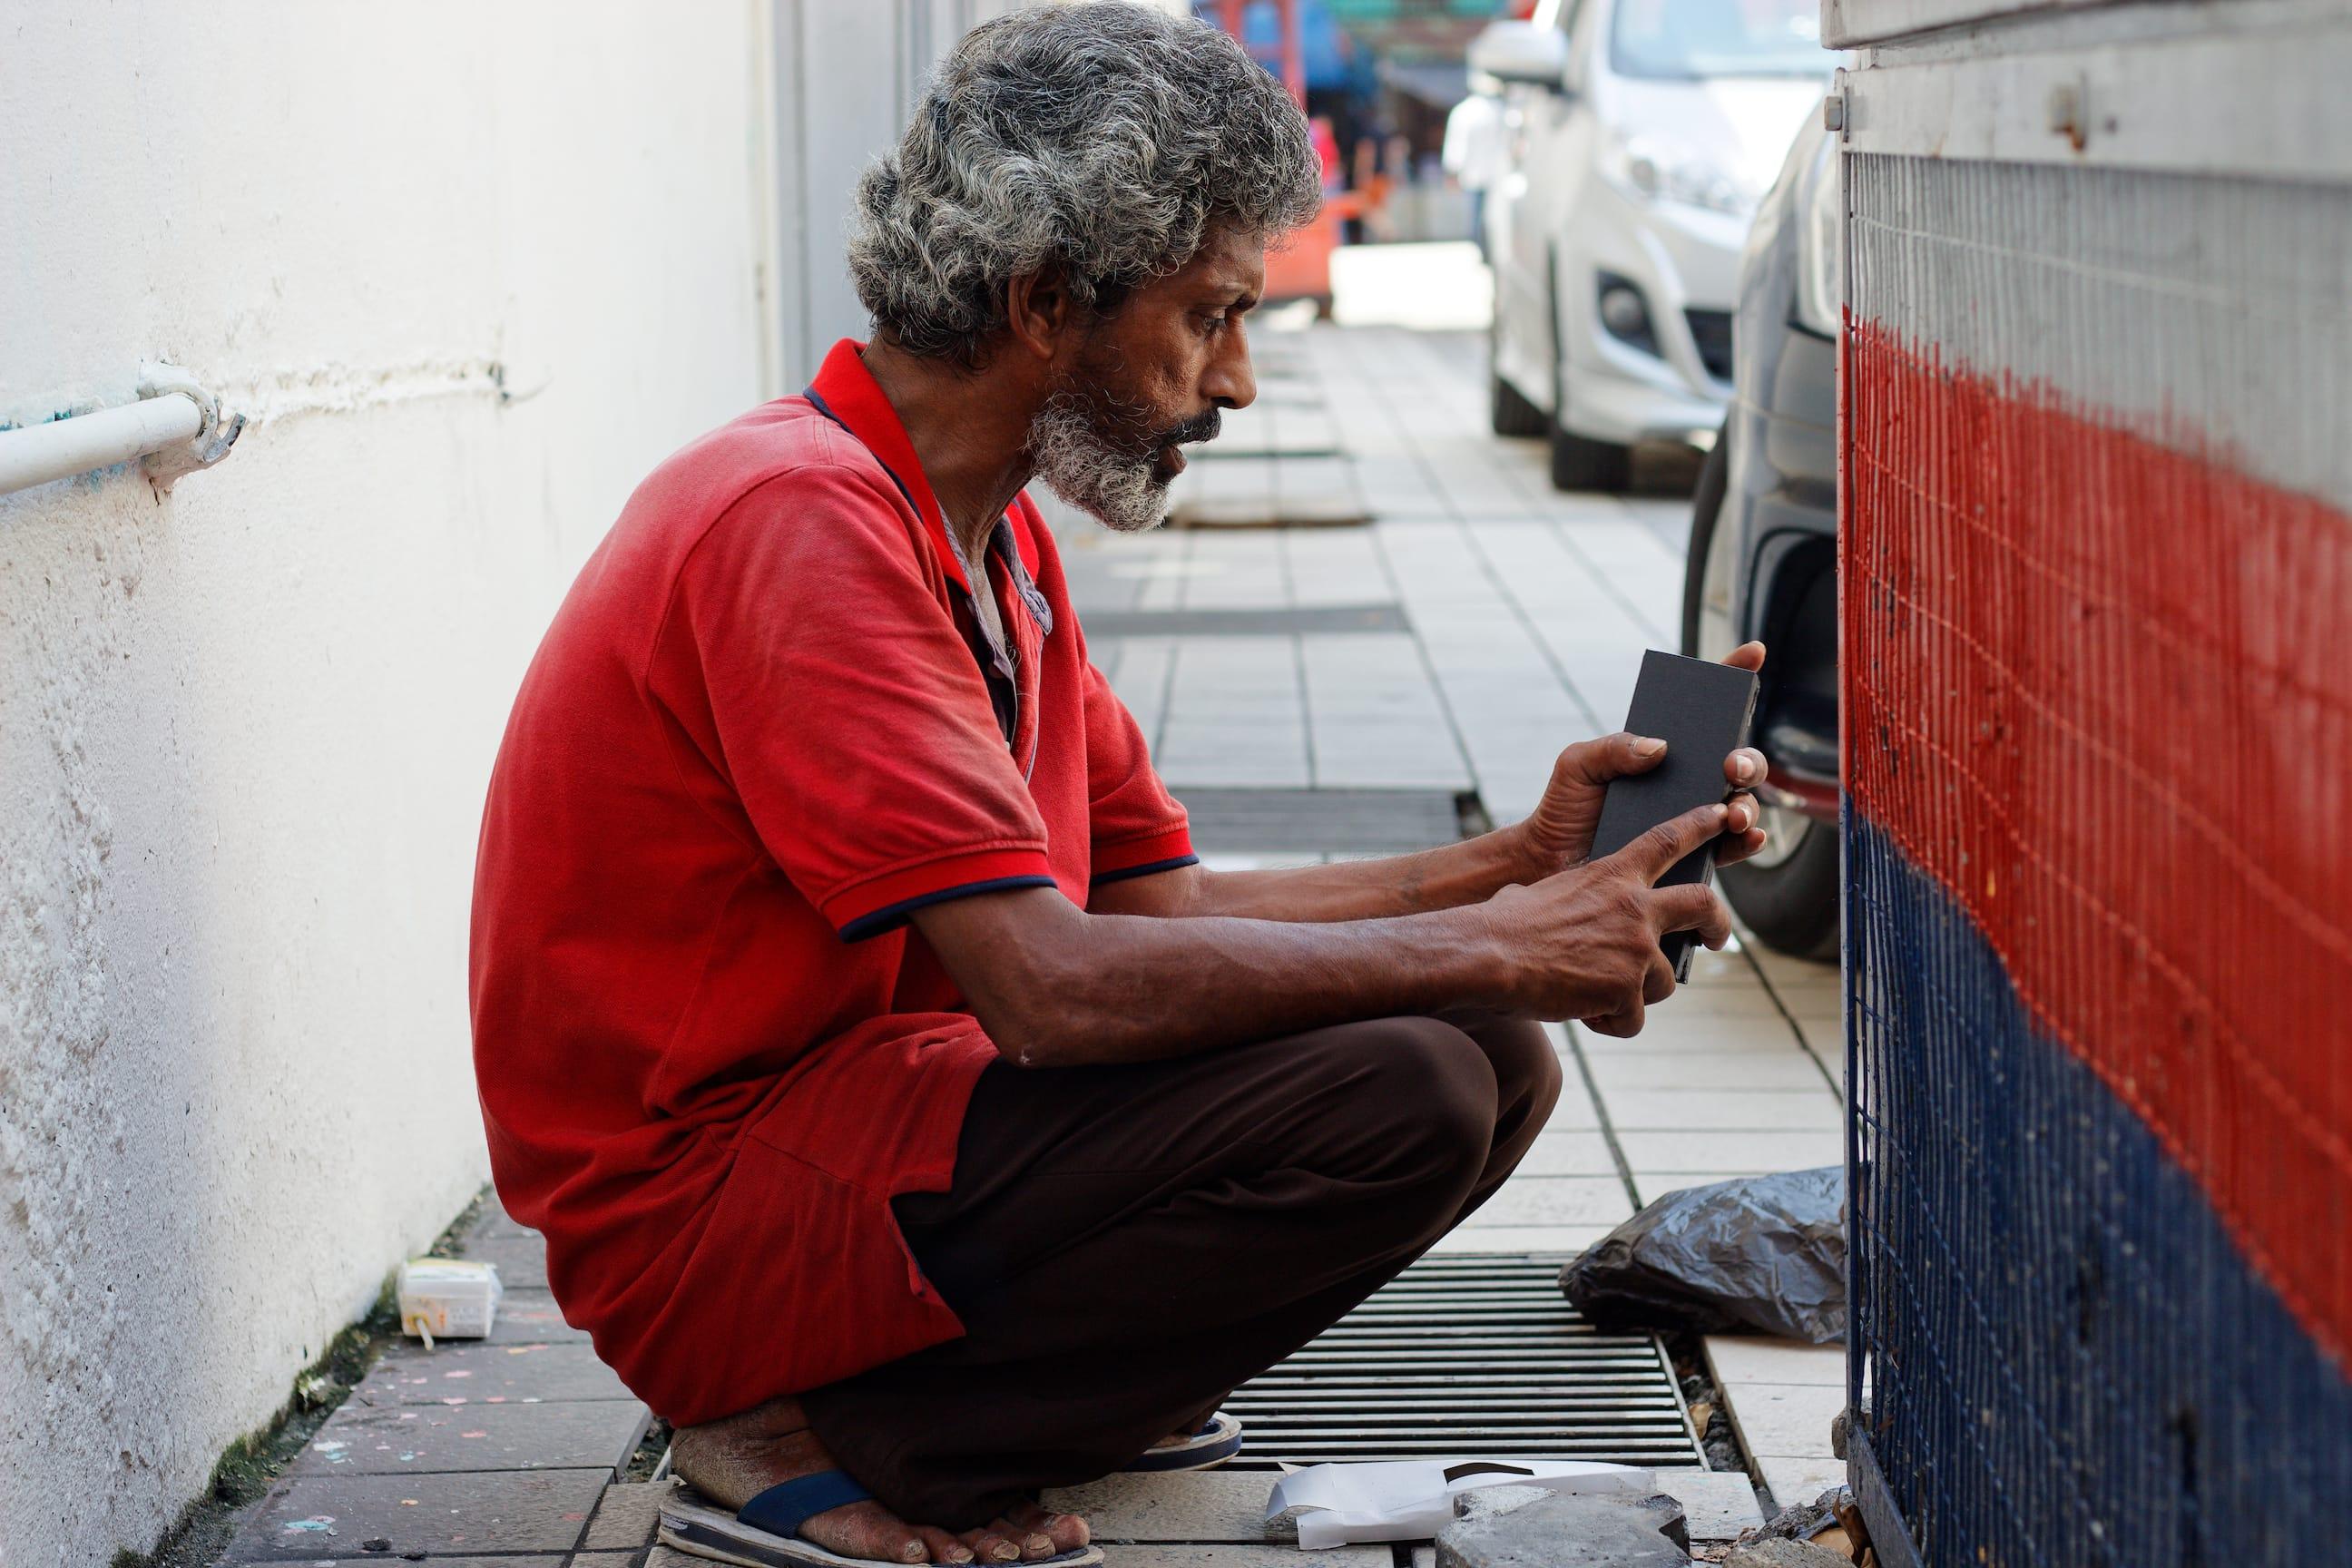 A Homeless Man in Kuala Lumpur